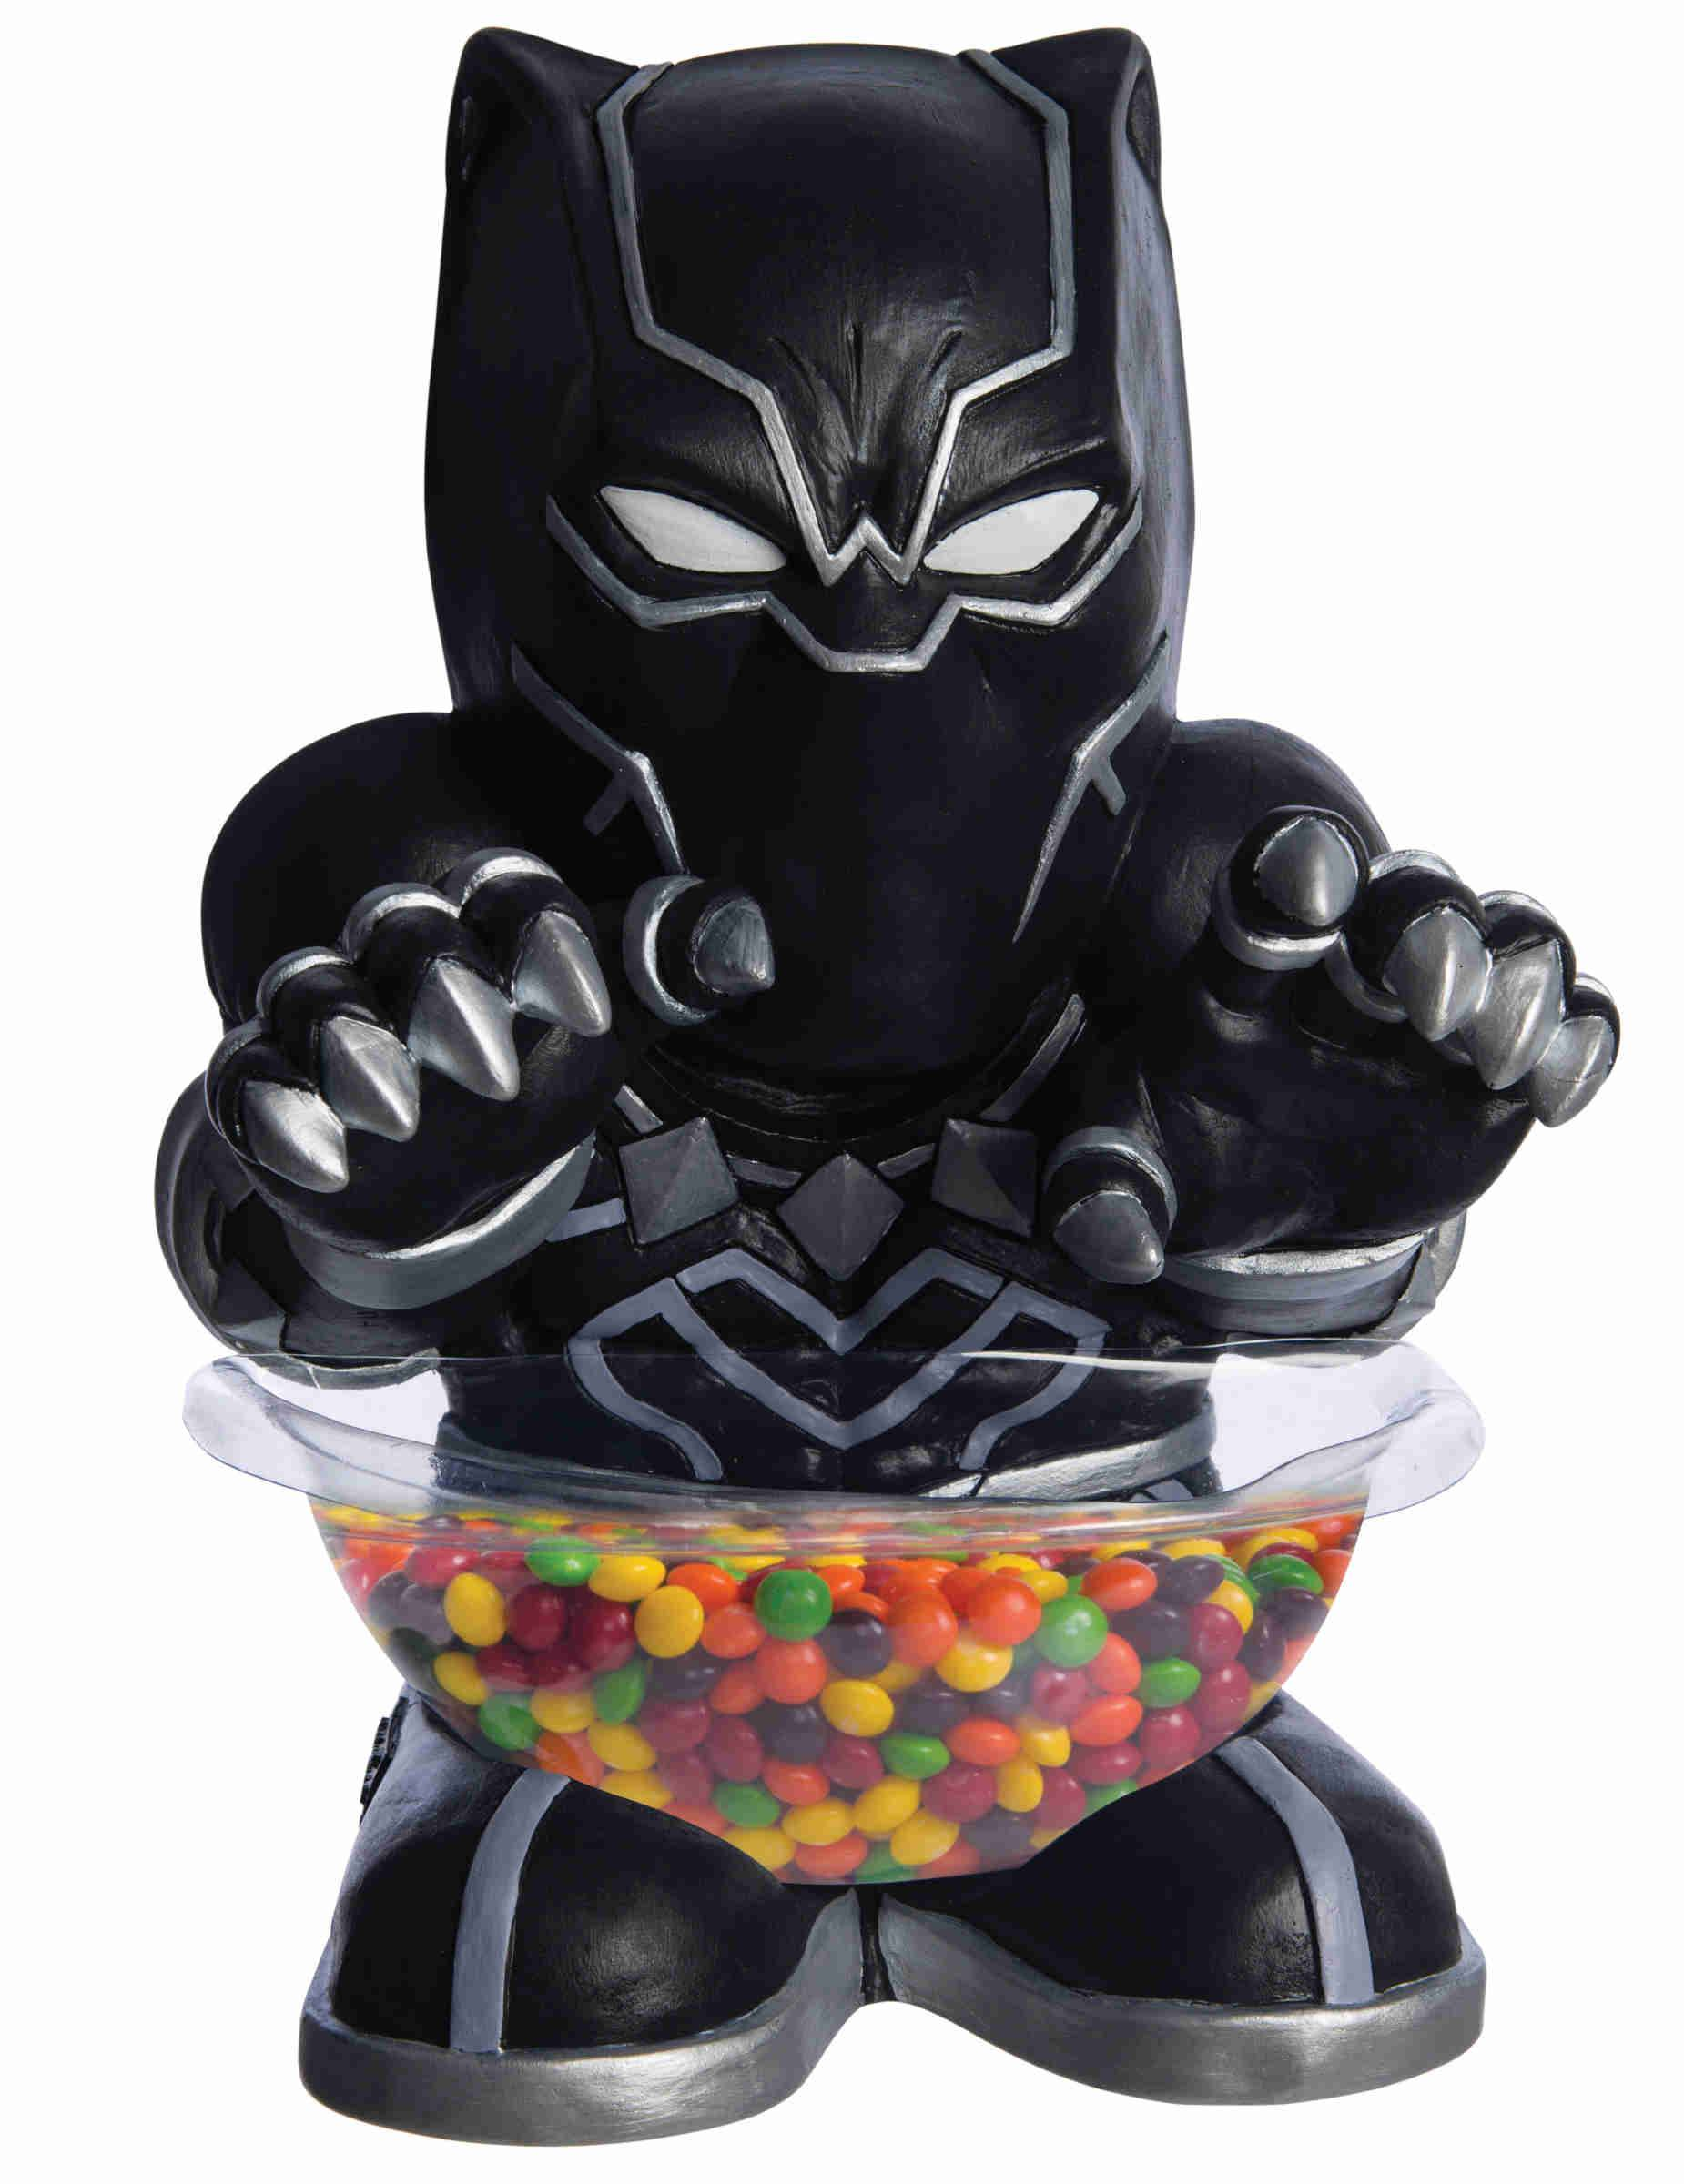 VegaooParty.it Mini portacaramelle Black Panther